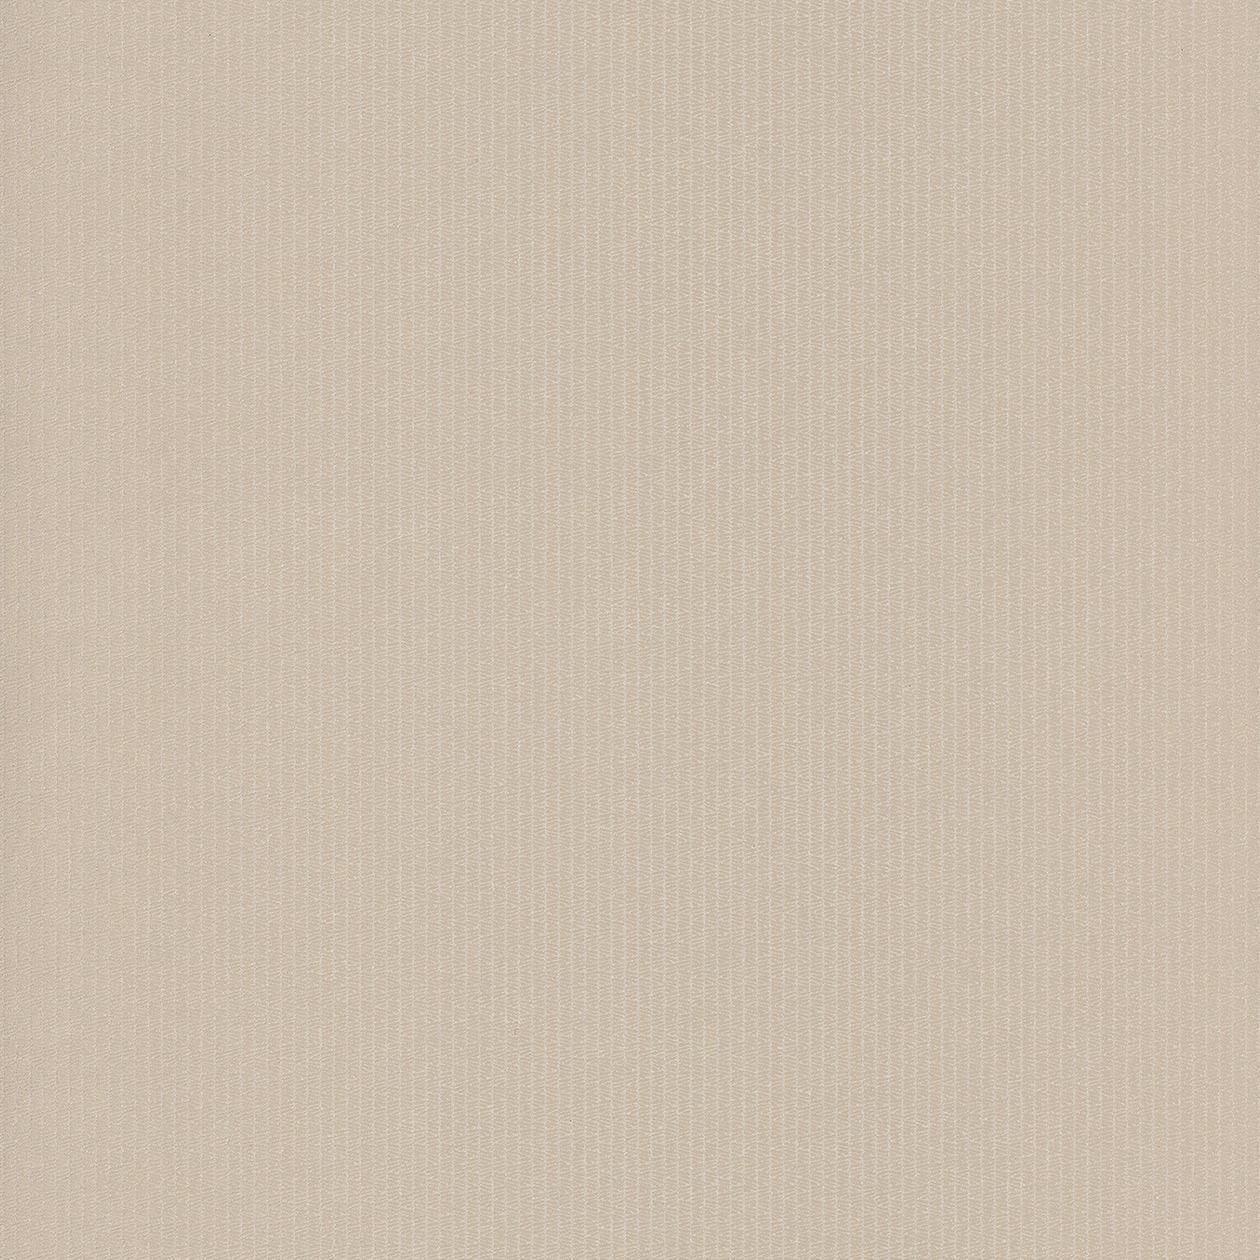 Французские обои Caselio,  коллекция Trio, артикулTIO68011210